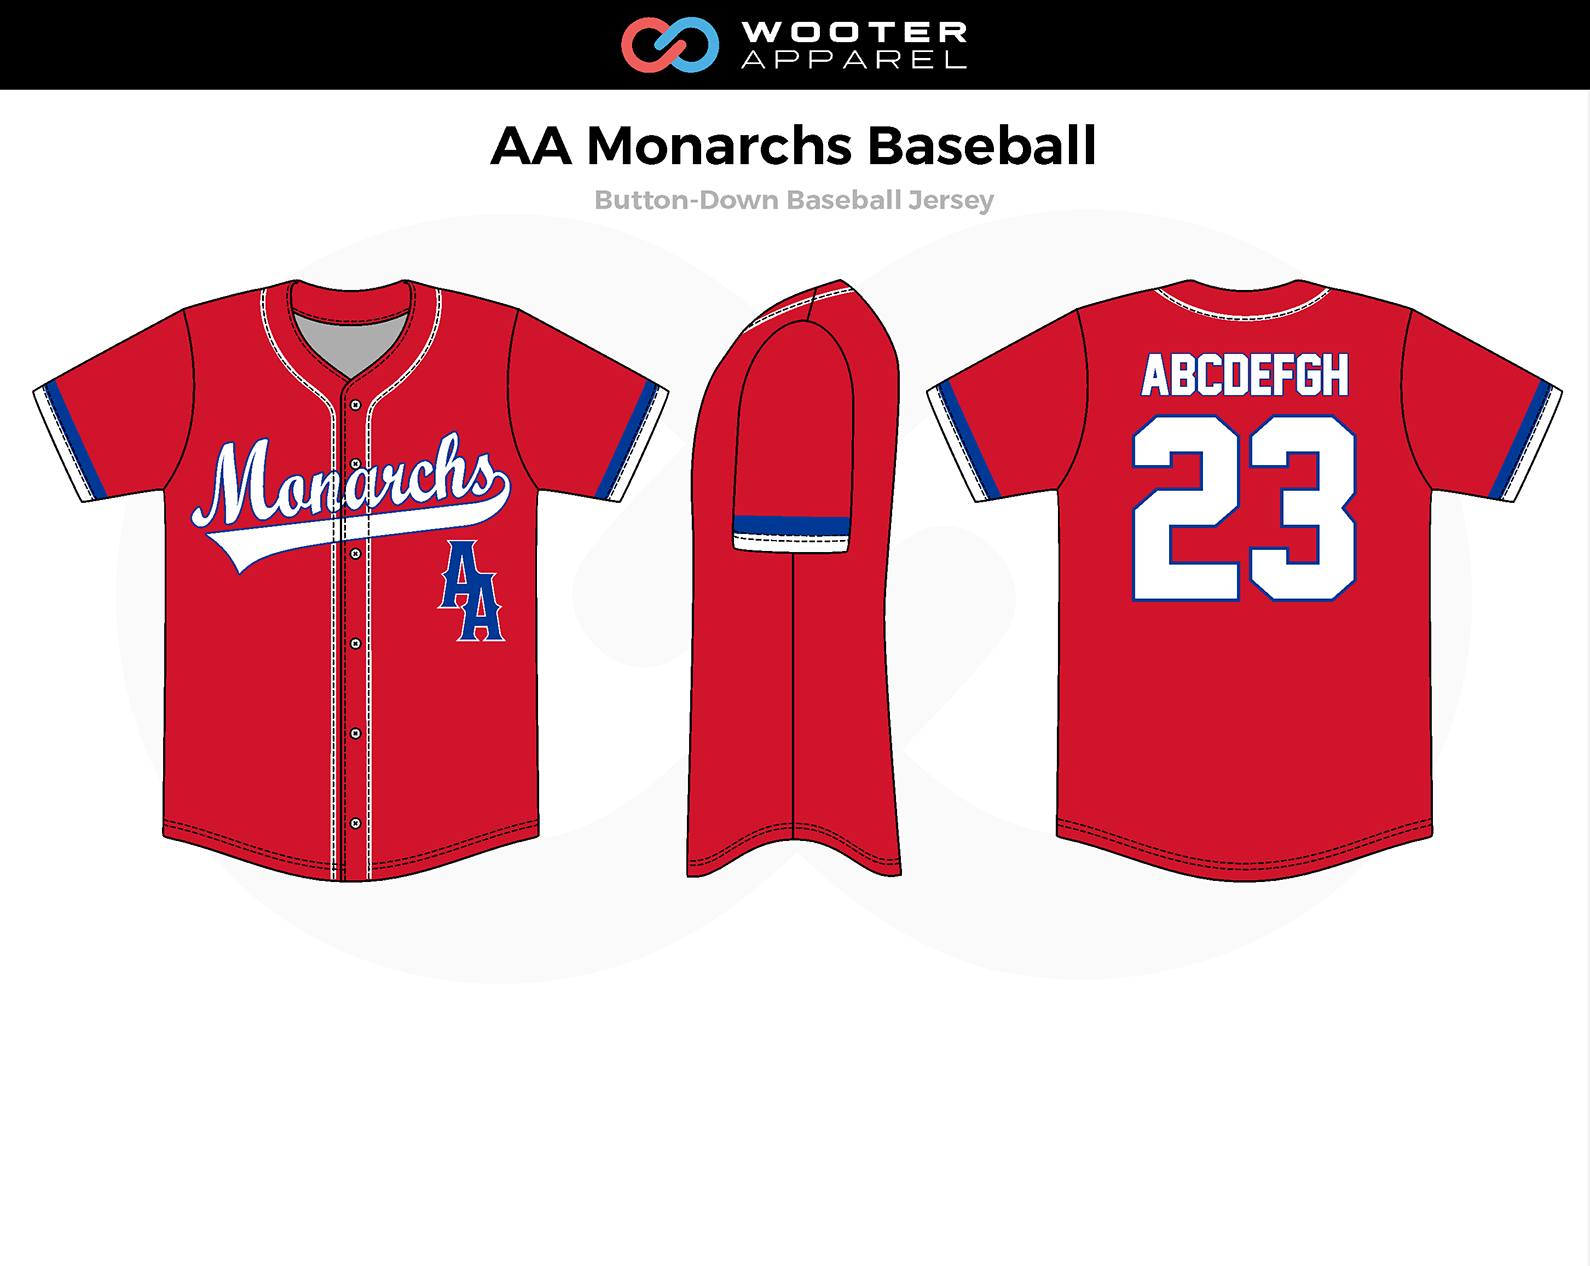 2018-09-13 AA Monarchs Baseball 3.png